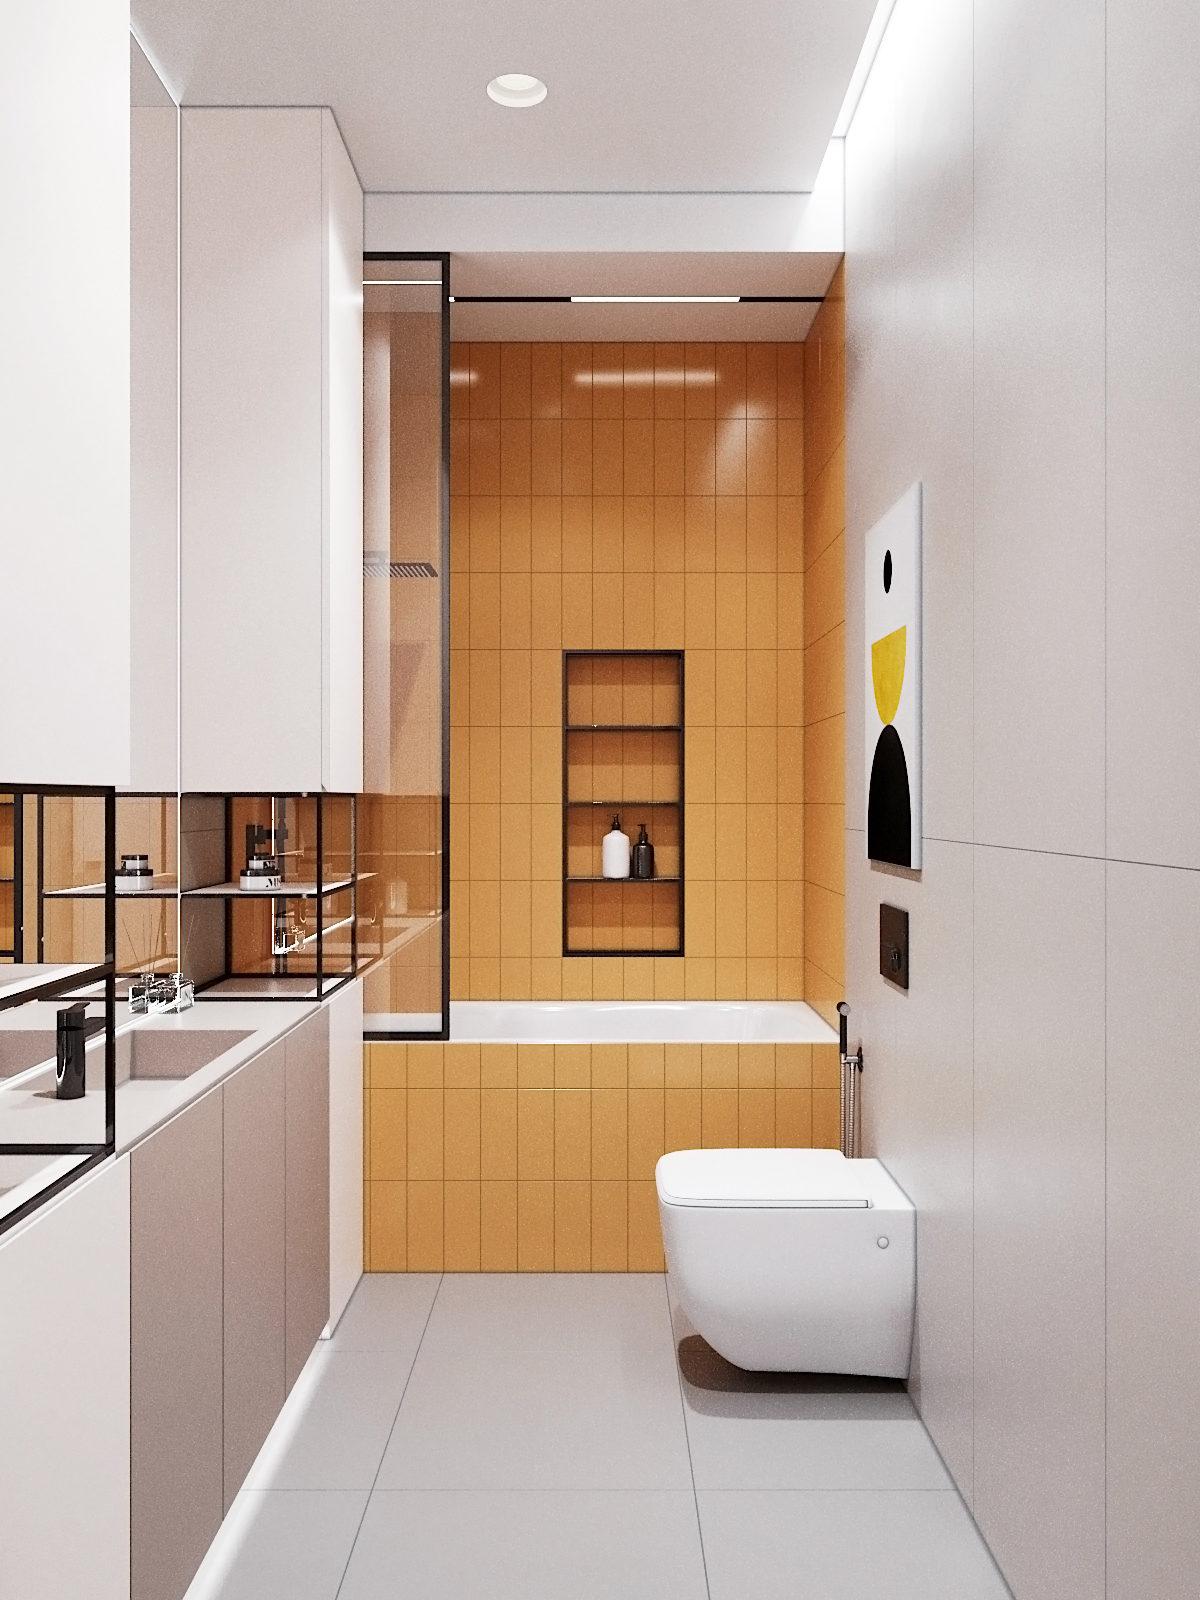 Bathroom_Interactive-LightMix_View01-1200x1600.jpg